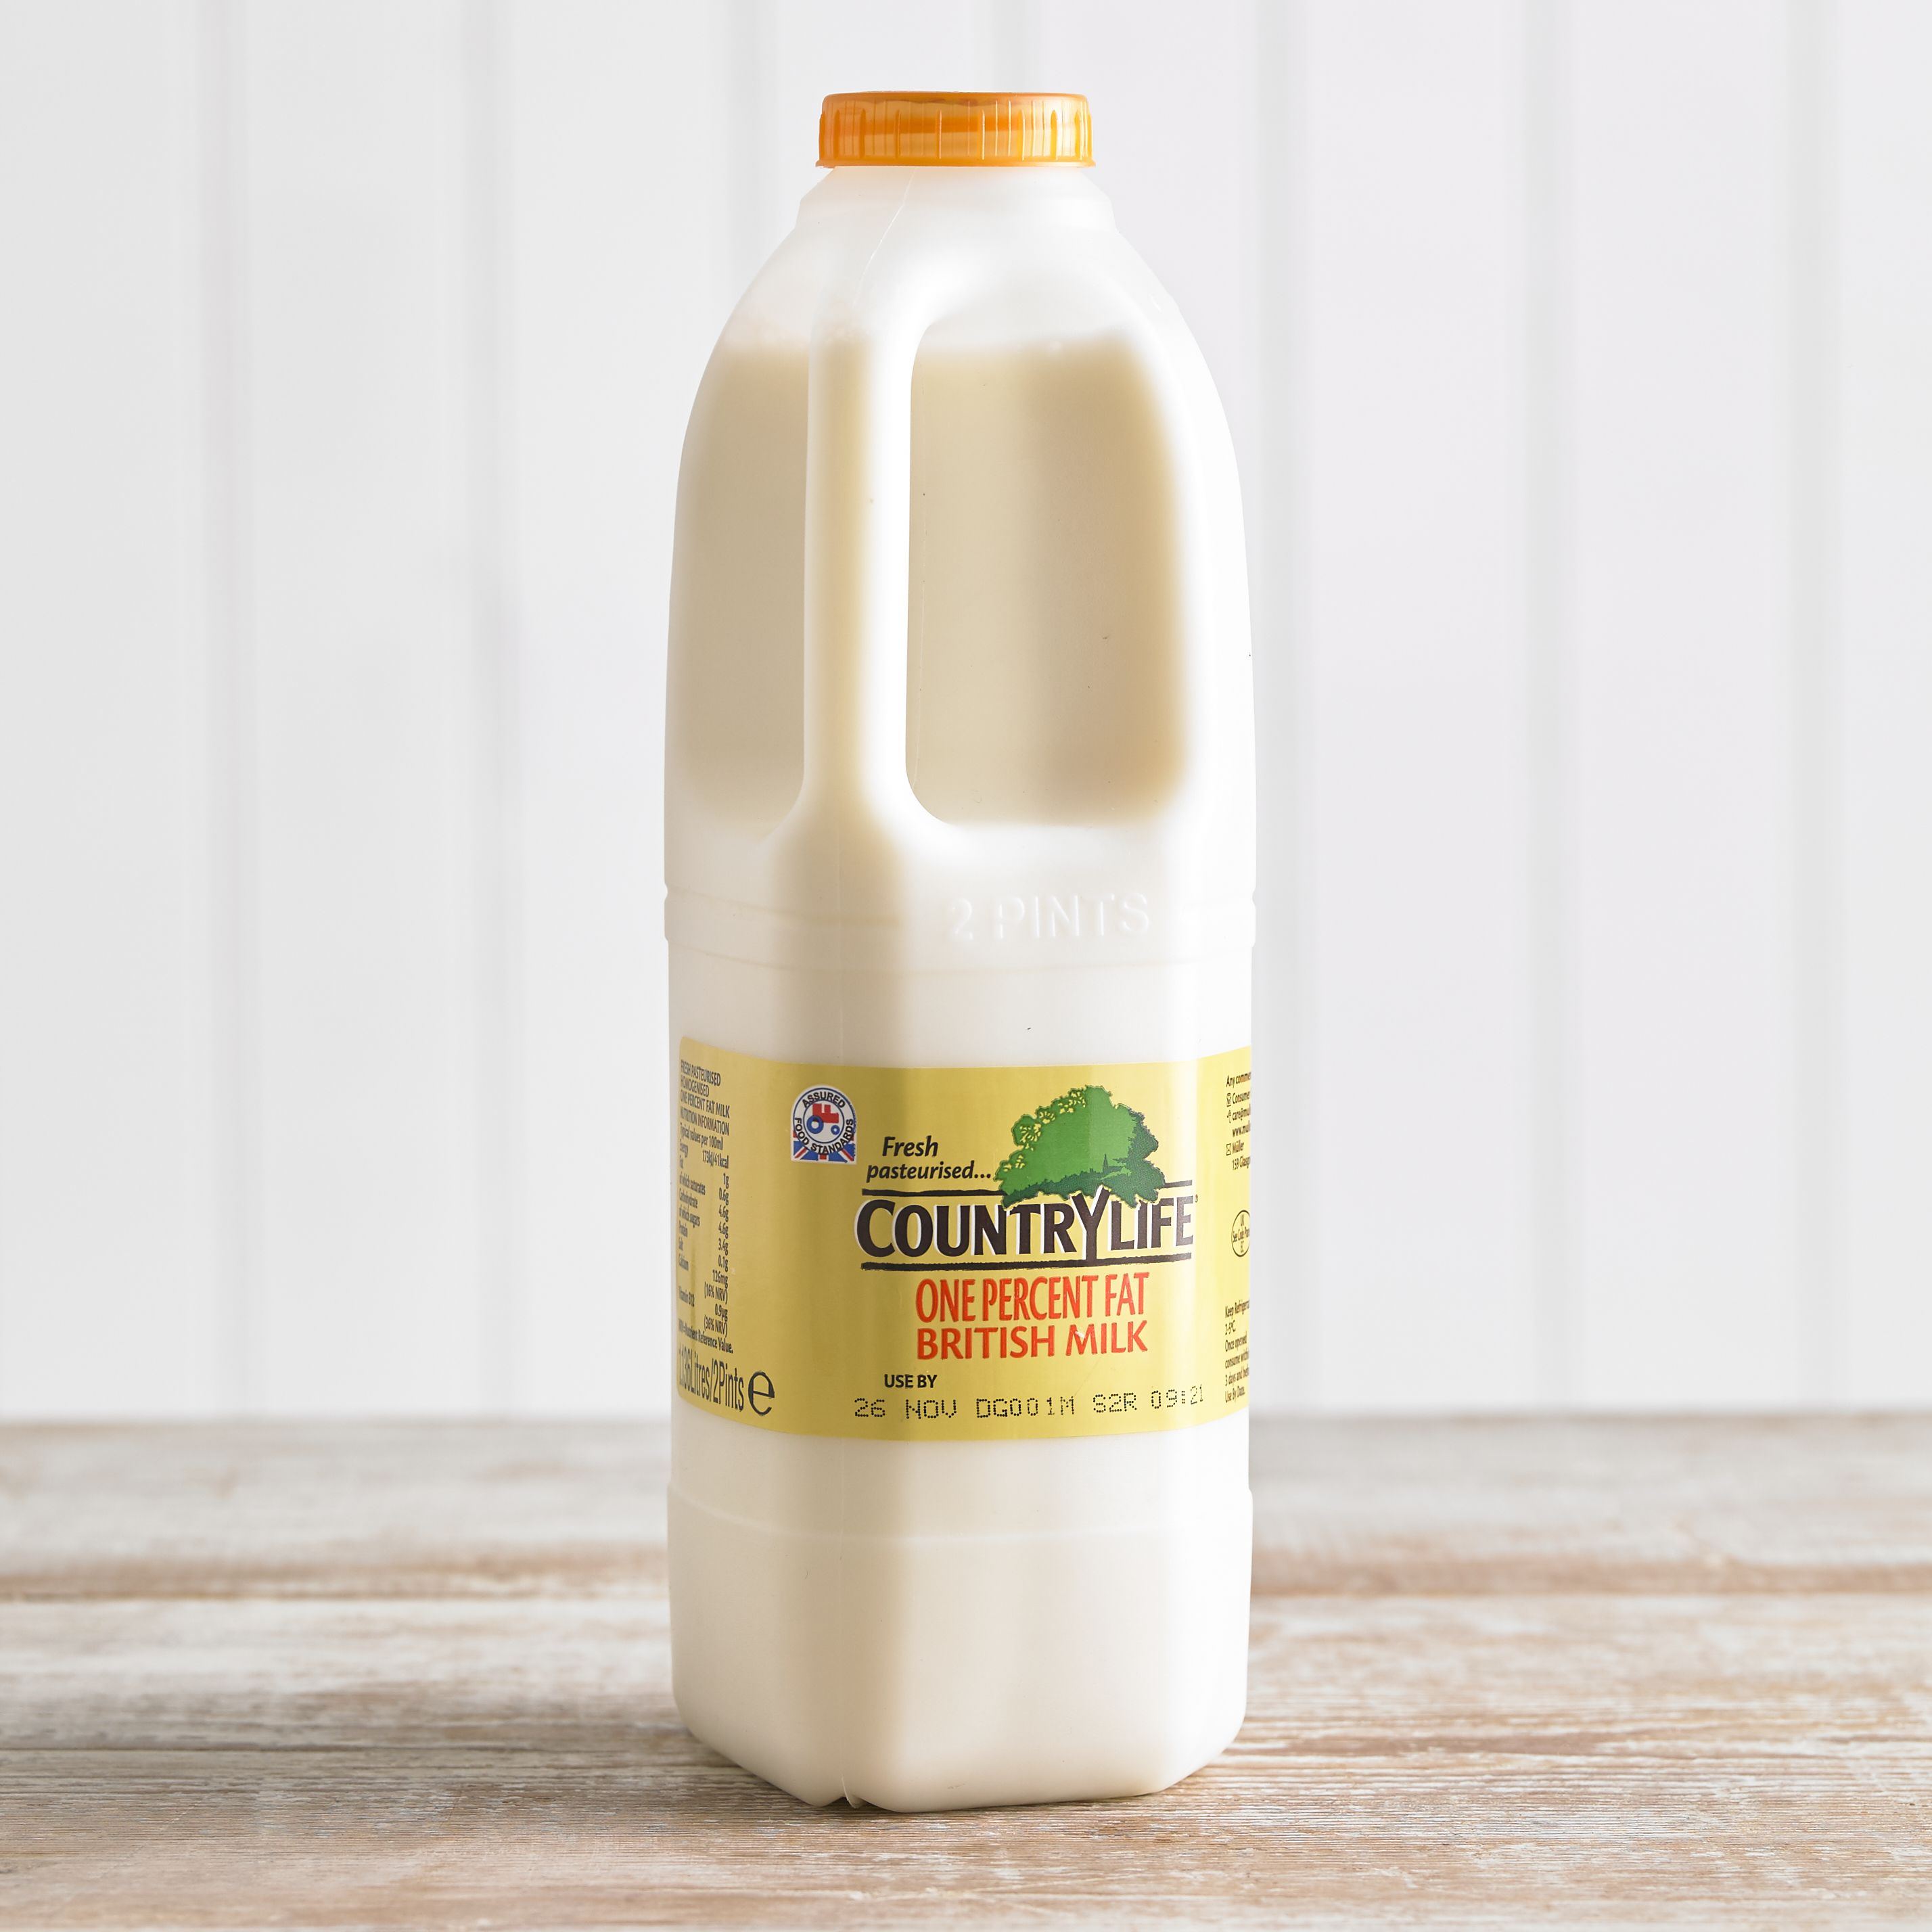 Country Life 1% Fat Milk, 1.136L, 2pt